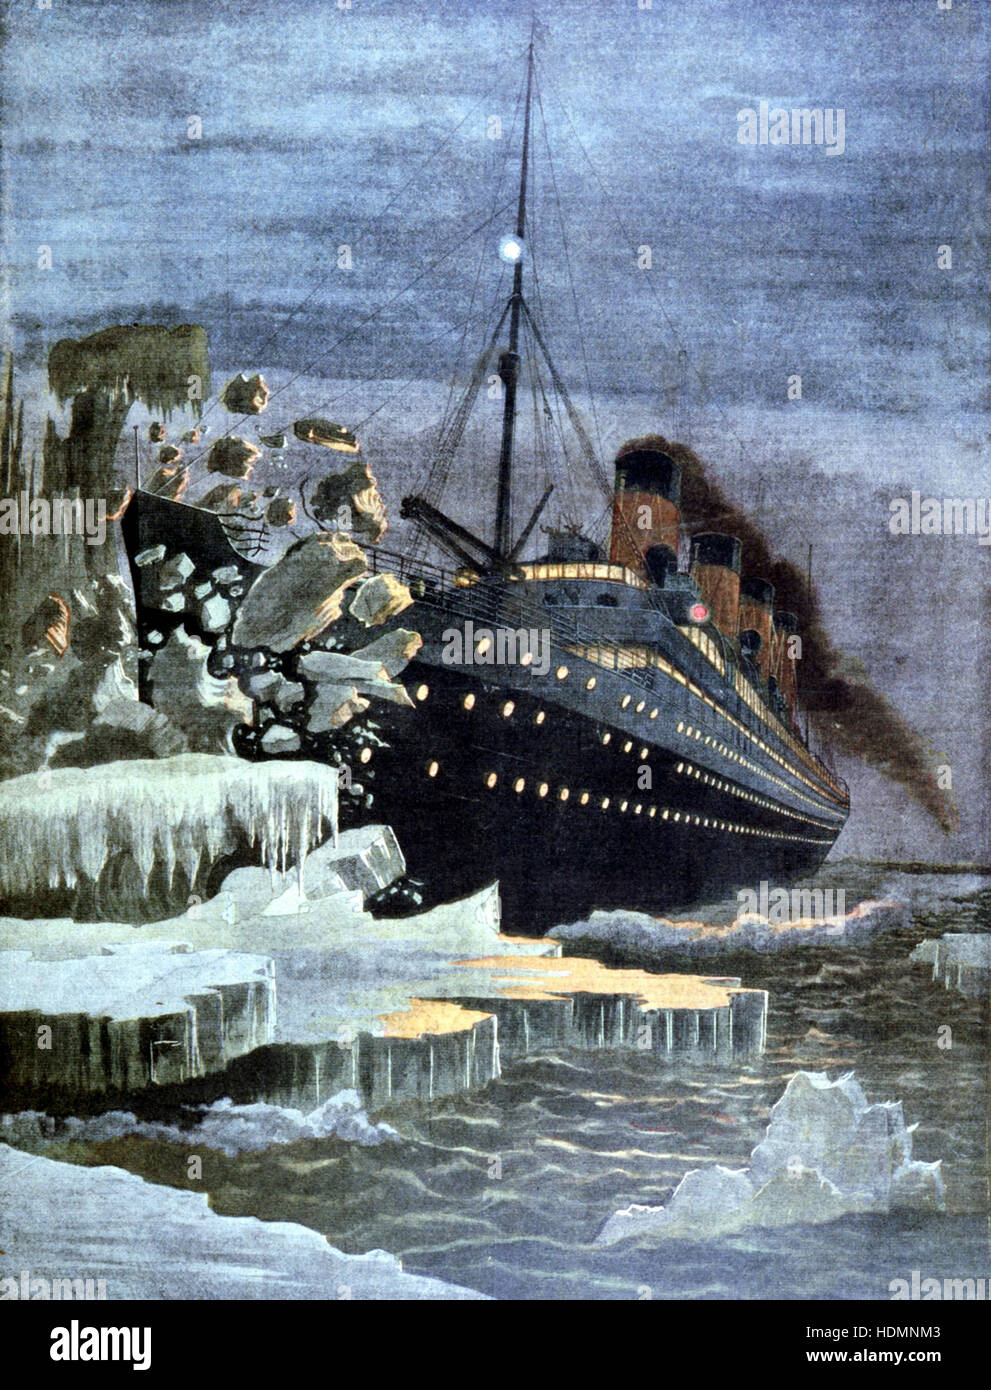 'Le Petit Journal' Paris - SS Titanic colliding with an iceberg 14 April 1912 - Stock Image